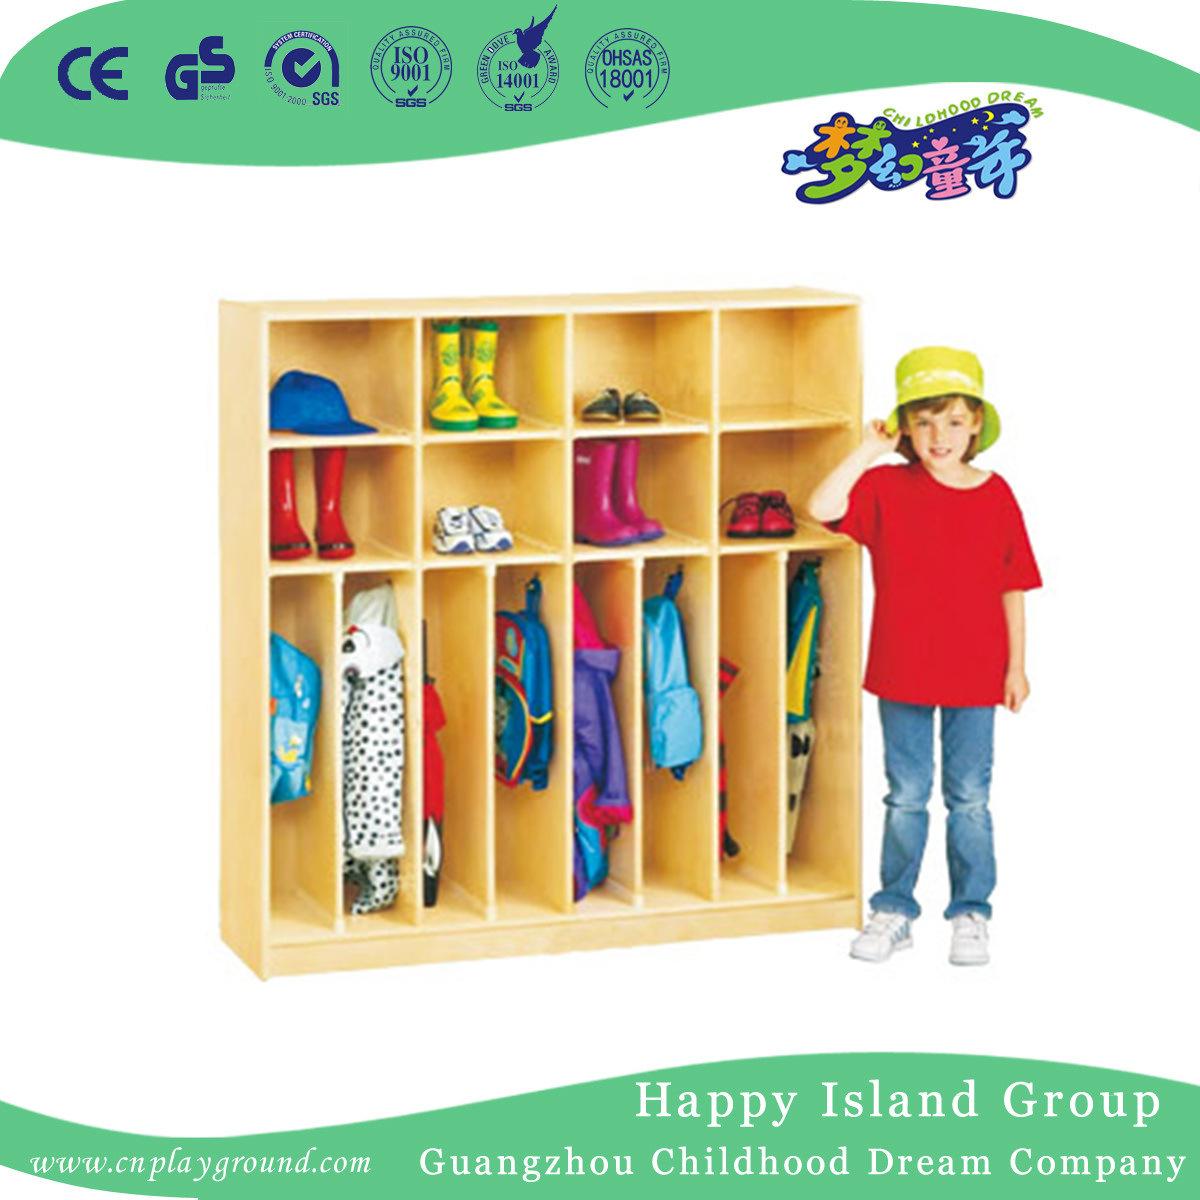 Guangzhou Childhood Dream Recreation Equipment Co., Ltd.